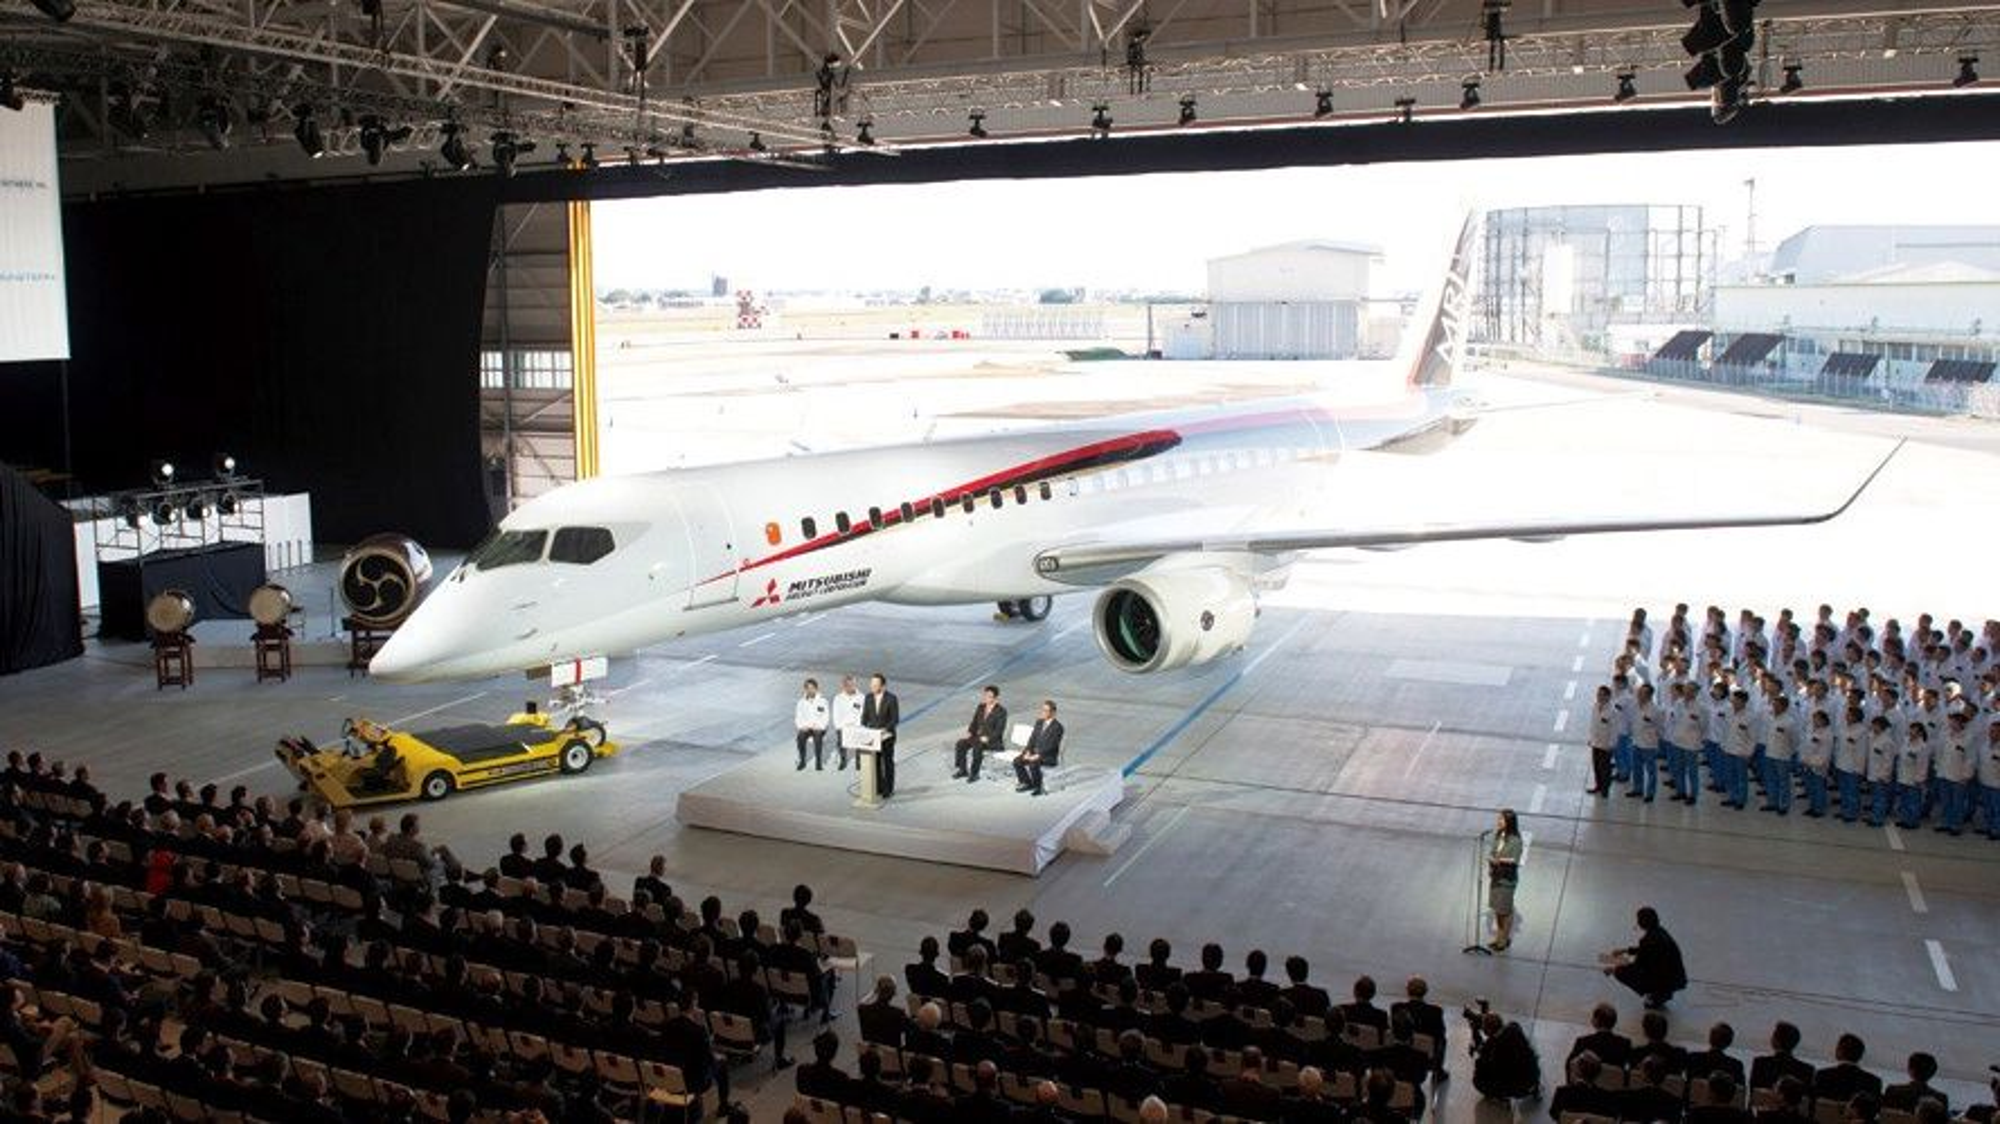 Utrullingsseremonien for Mitsubishi MRJ fant sted 18. oktober 2014.